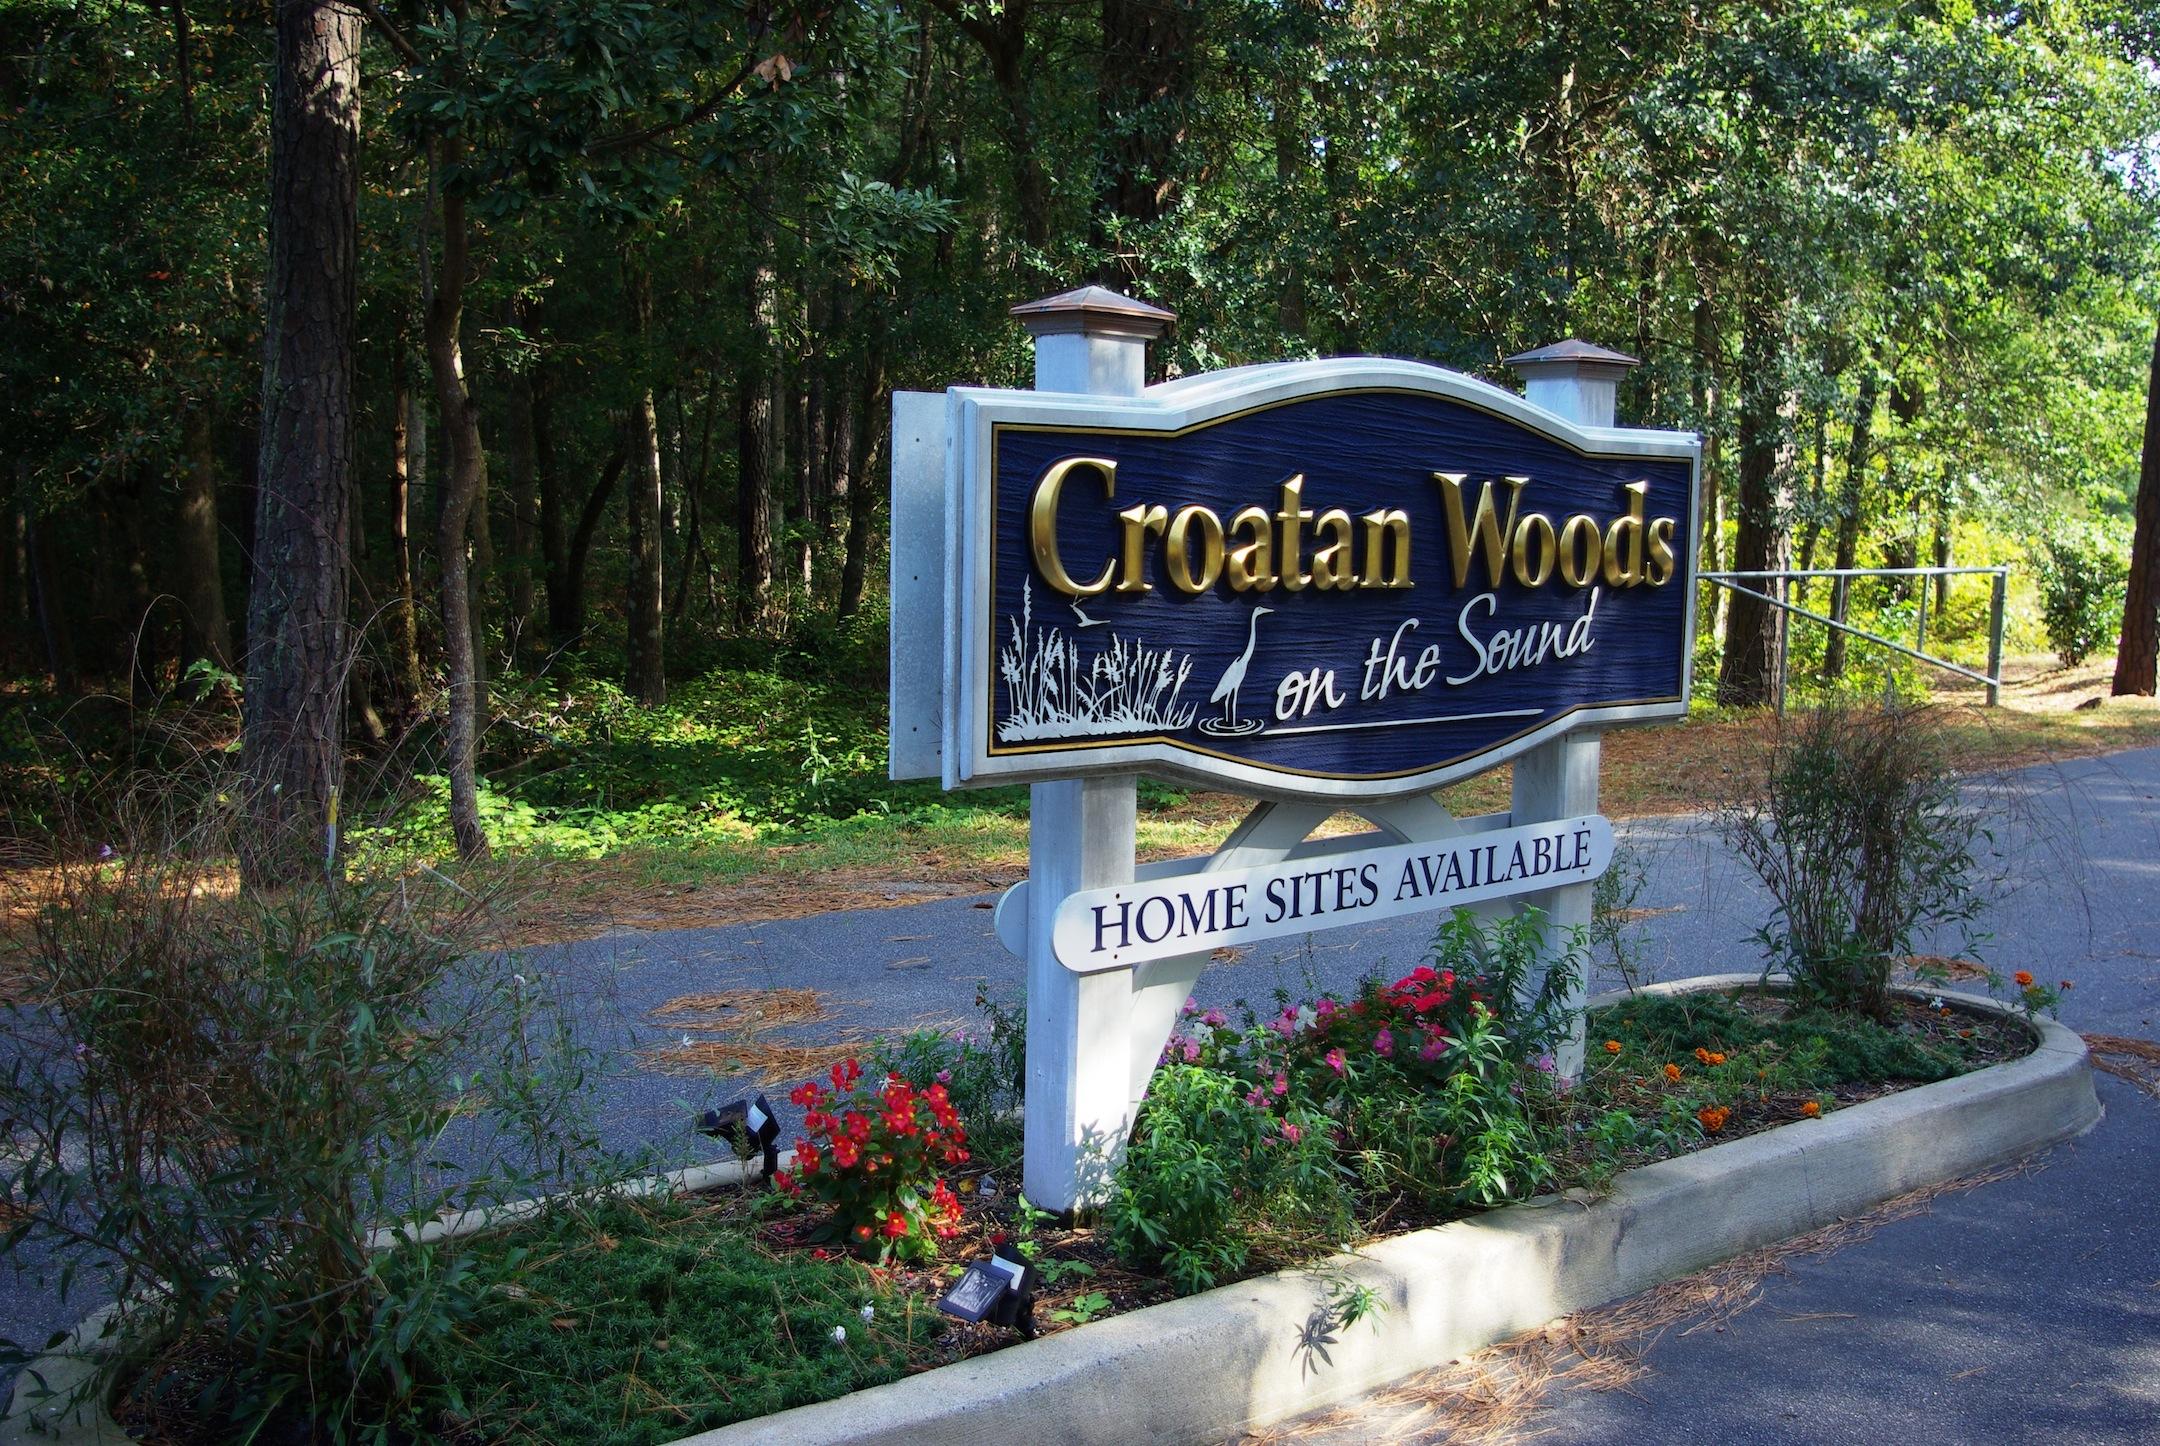 Croatan Wood, a new community in Manteo NC